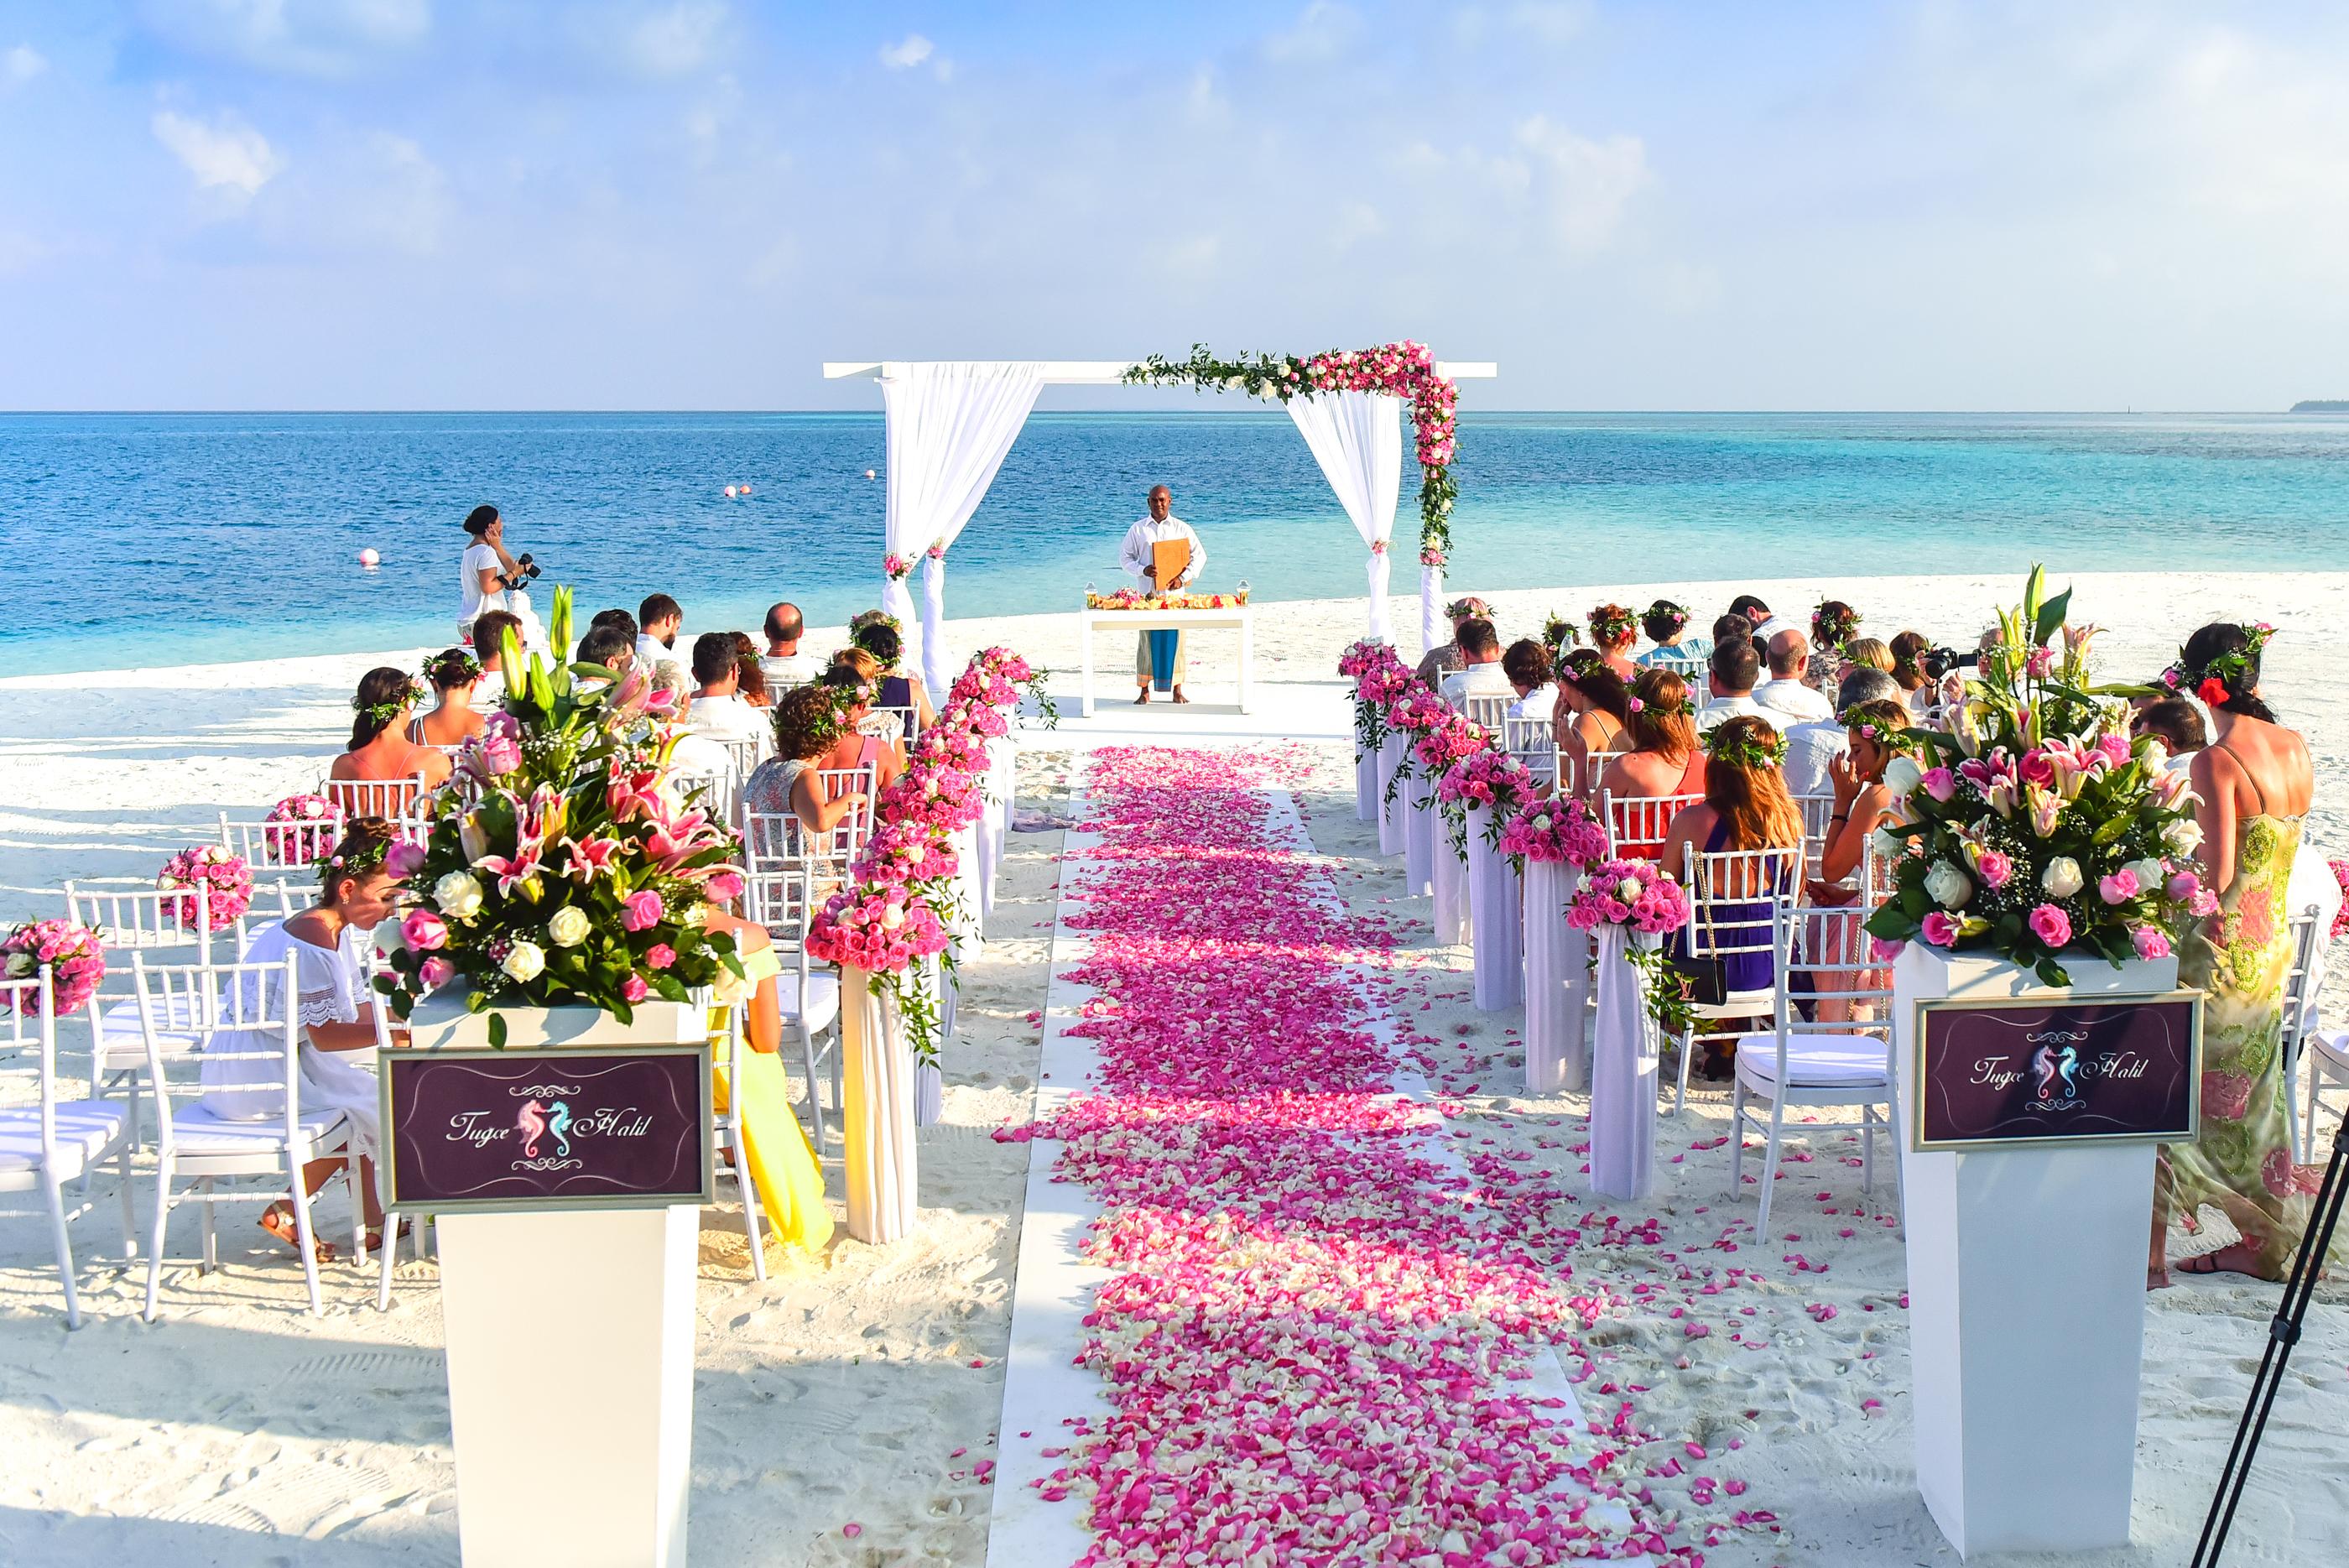 Free Images  Man, Beach, Sea, Water, Sand, Ocean, People, Woman, Summer, Vacation -5251